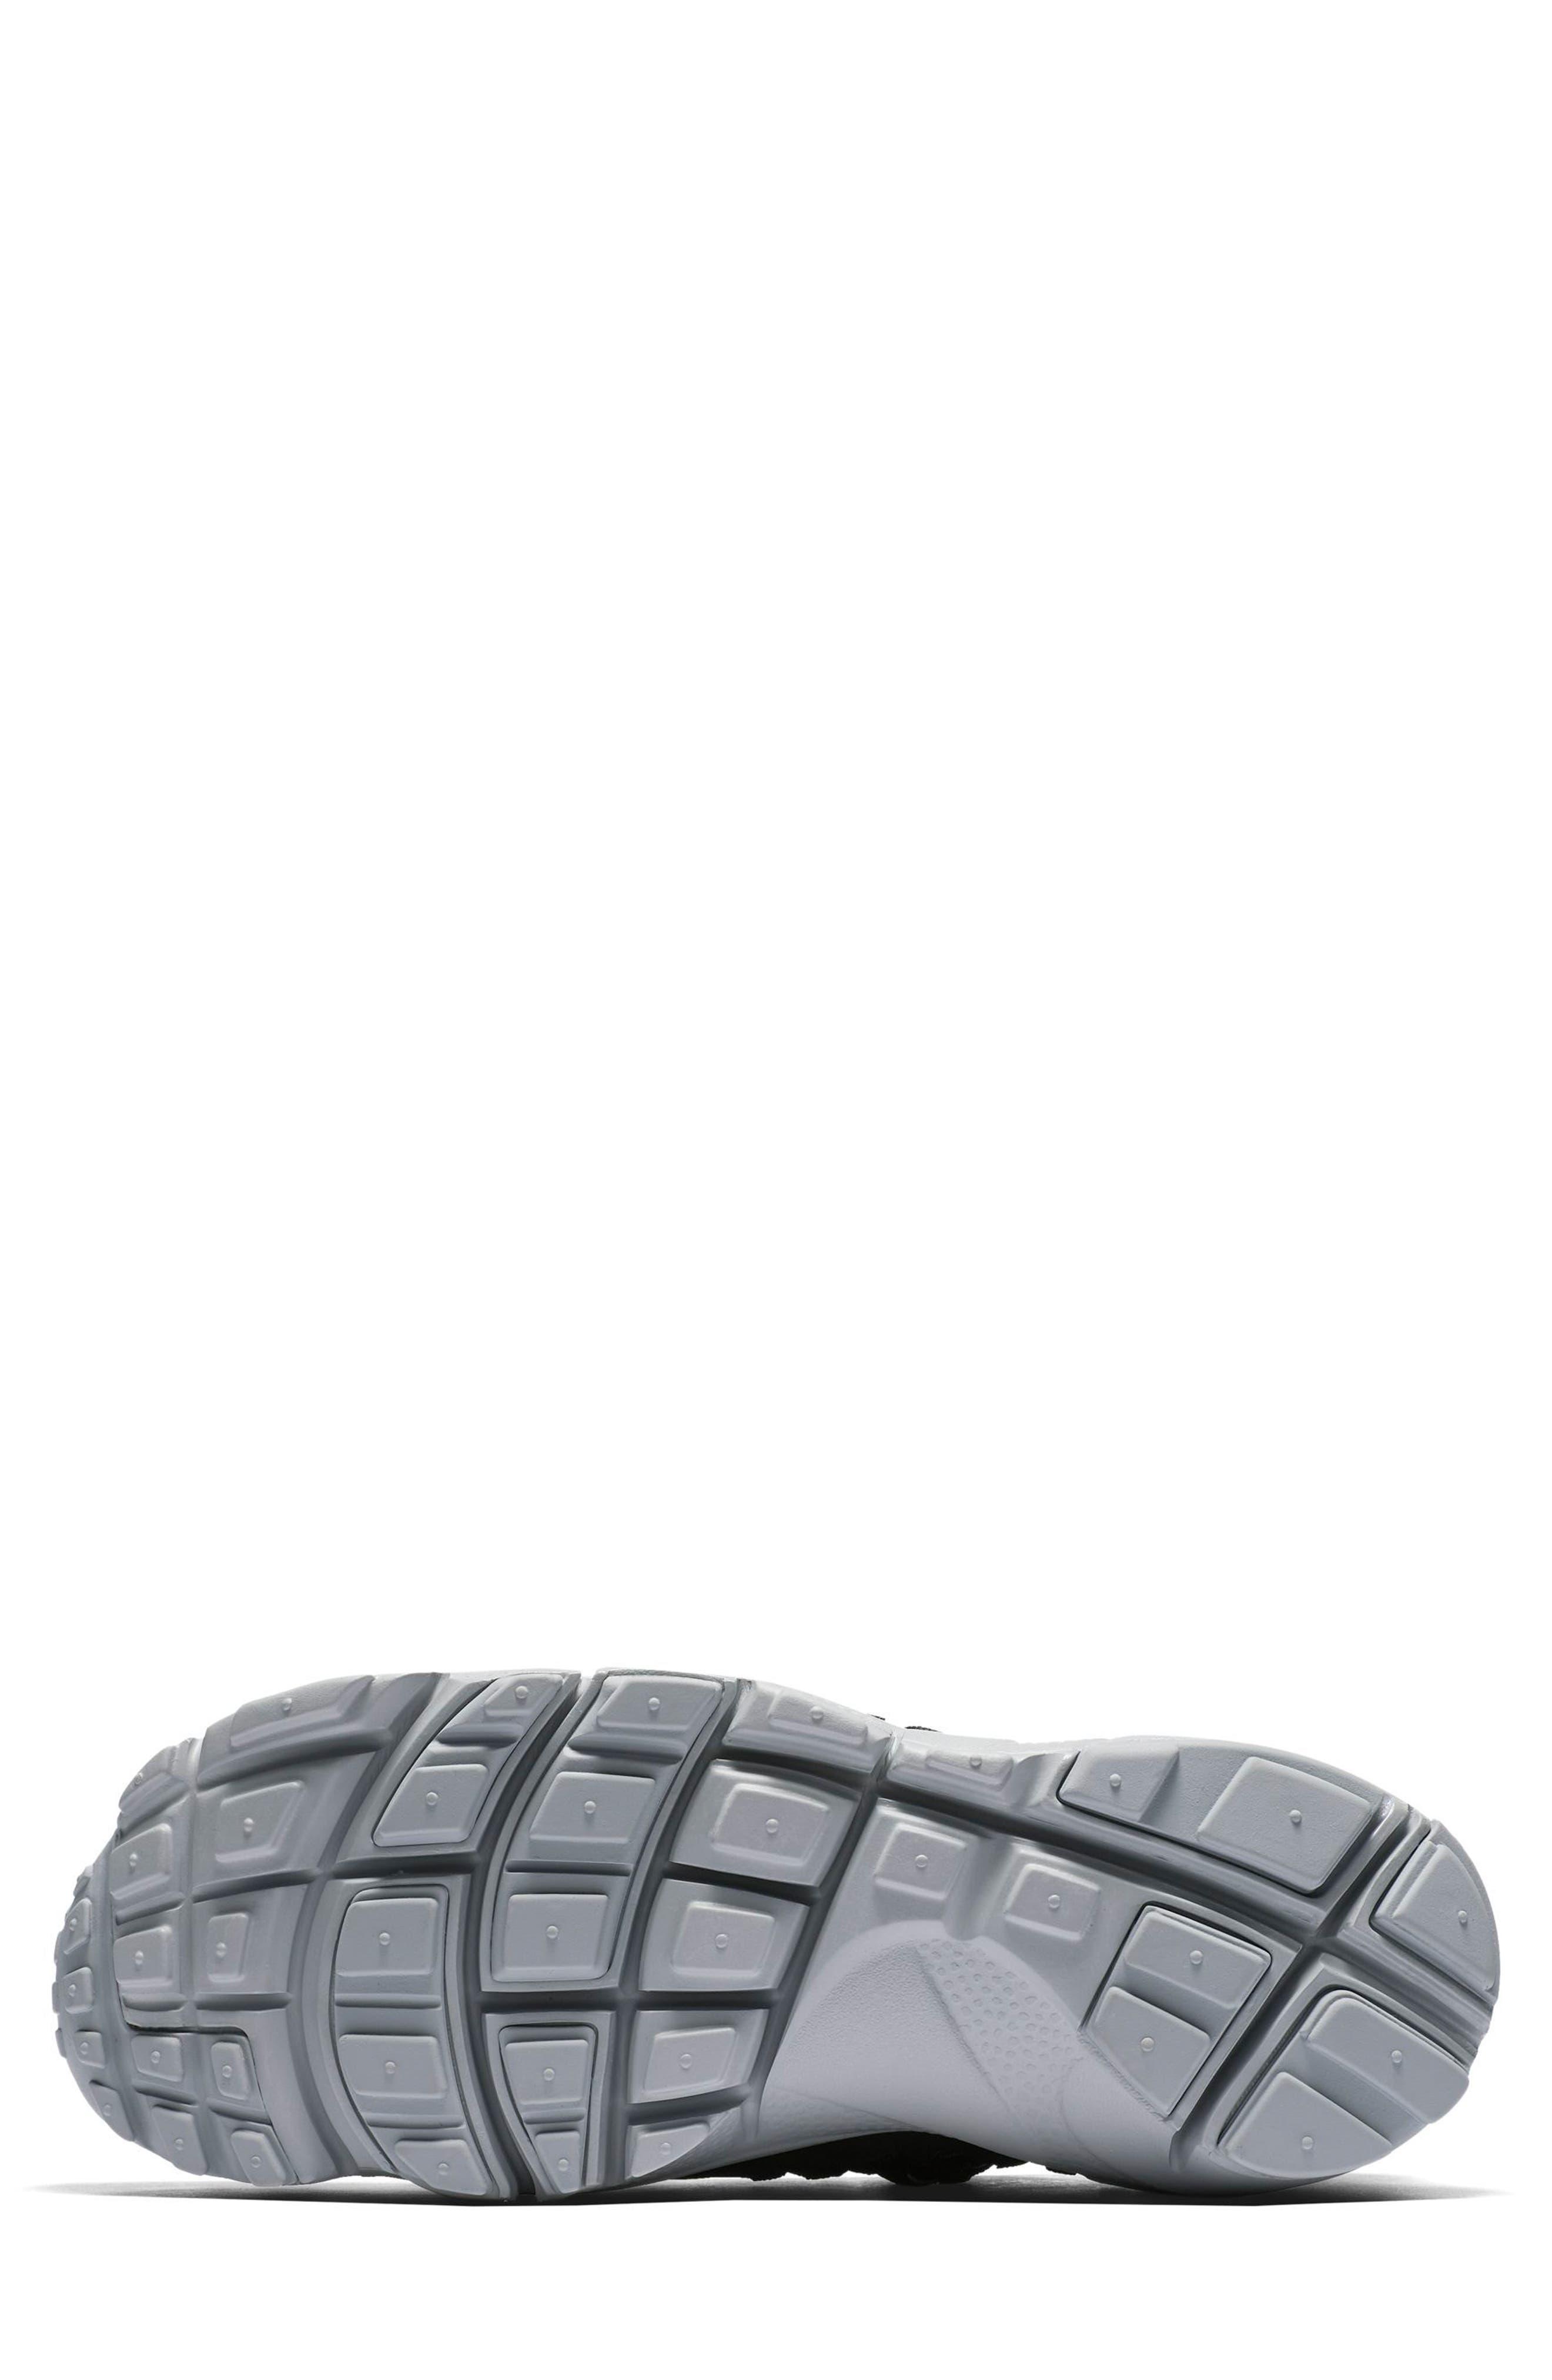 Air Footscape Woven Sneaker,                             Alternate thumbnail 6, color,                             Black/ Black/ Silver/ Grey